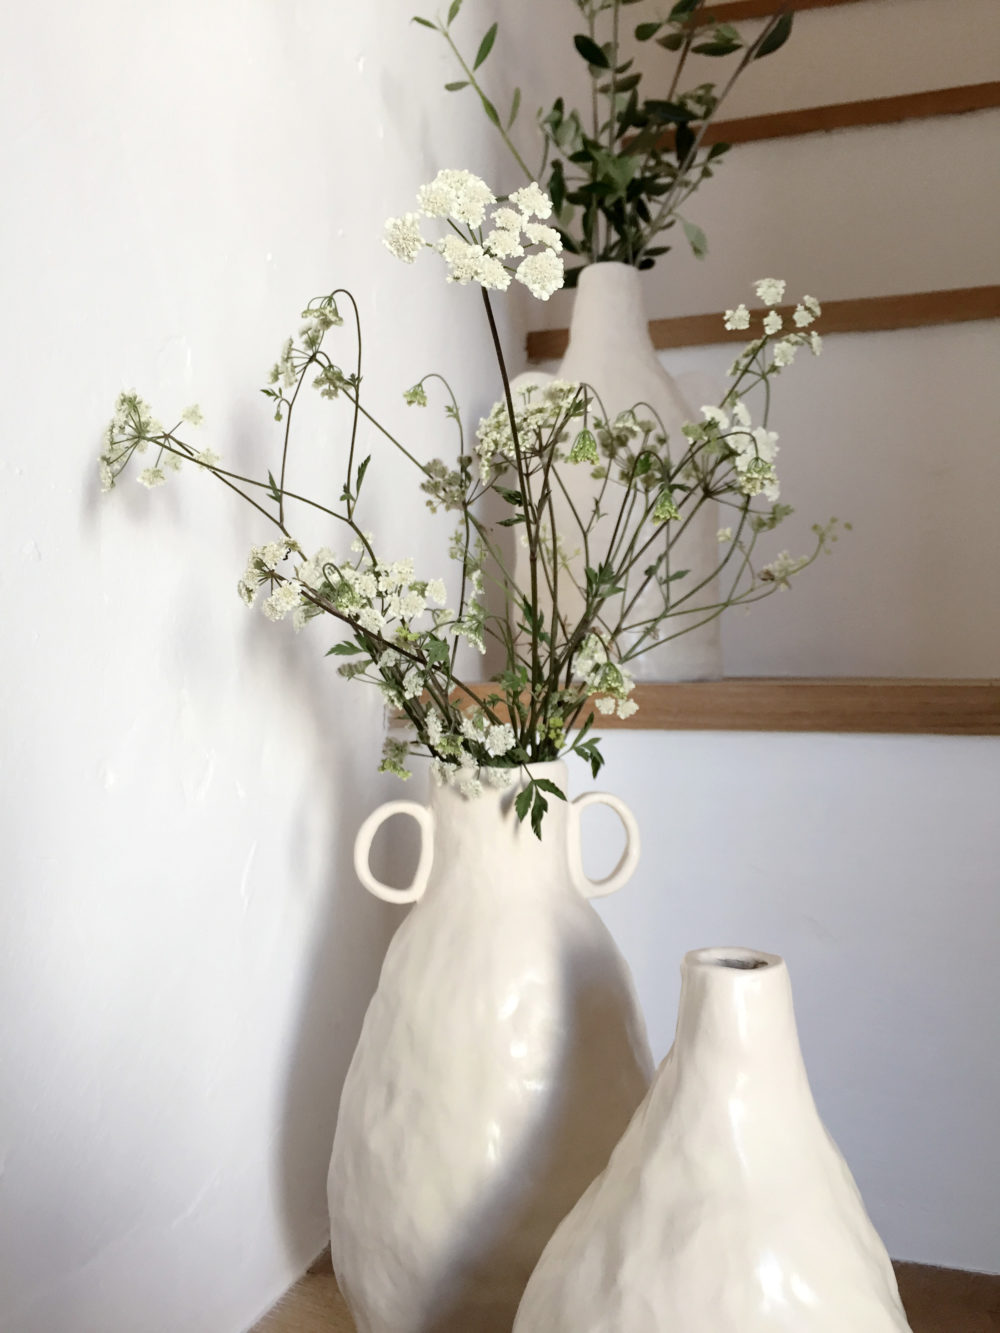 Ceràmica blanca